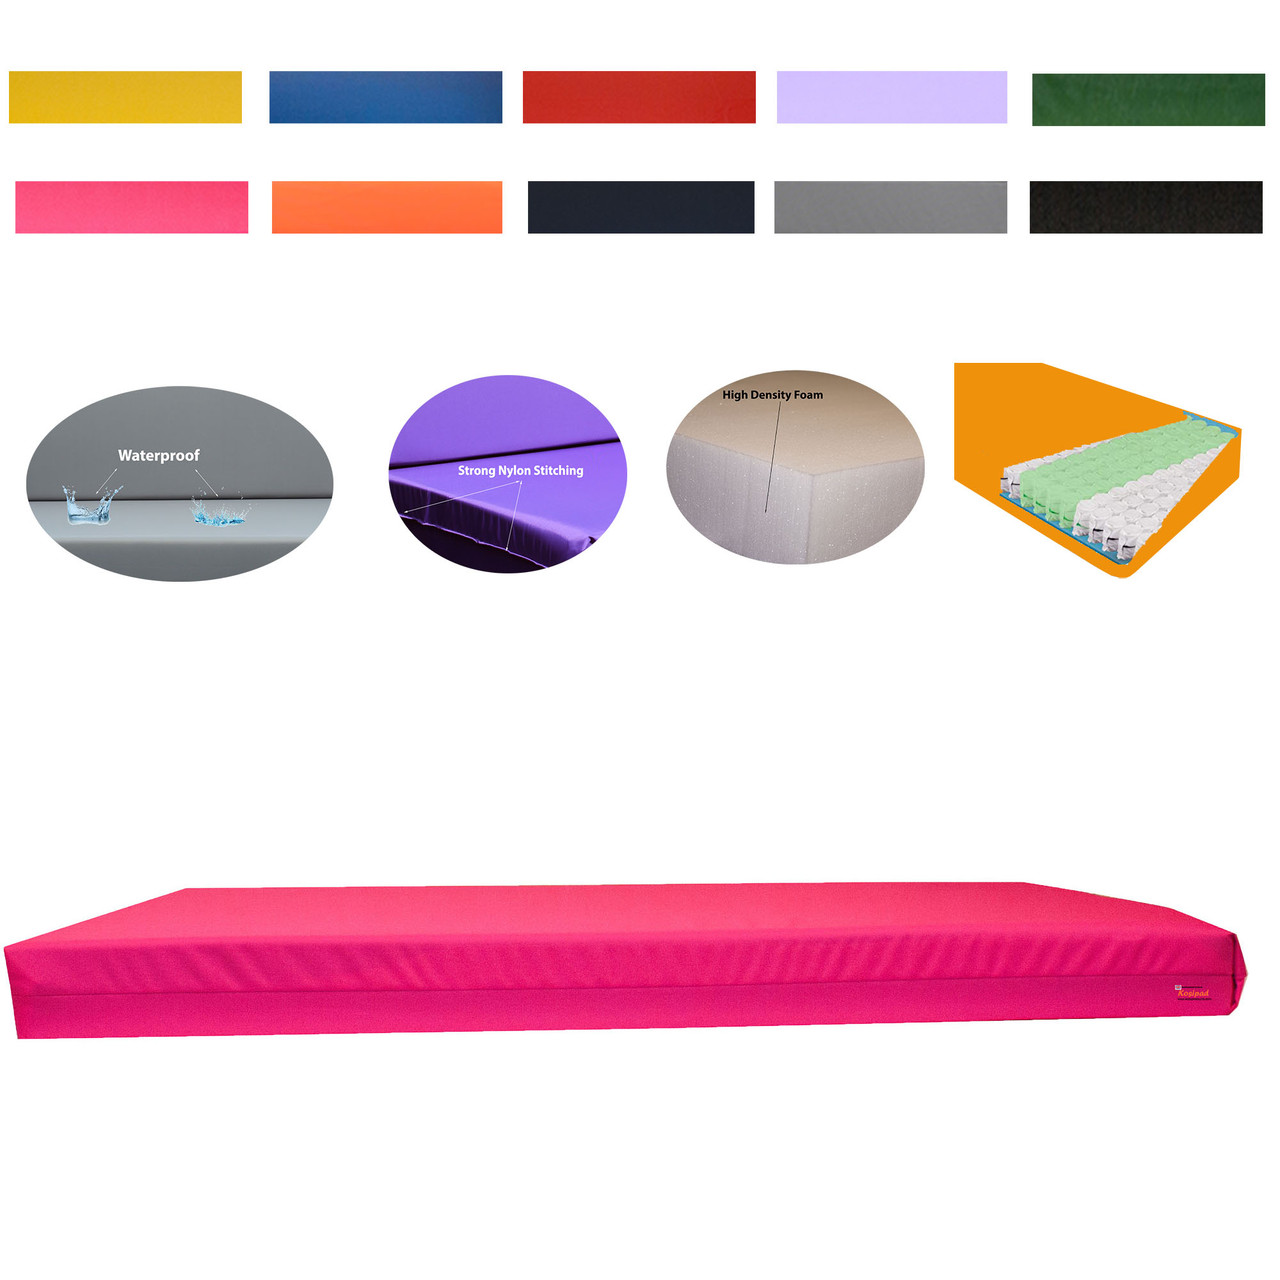 Kosipad 15cm Pocket Sprung gymnastics crash mats Pink thick crash mats